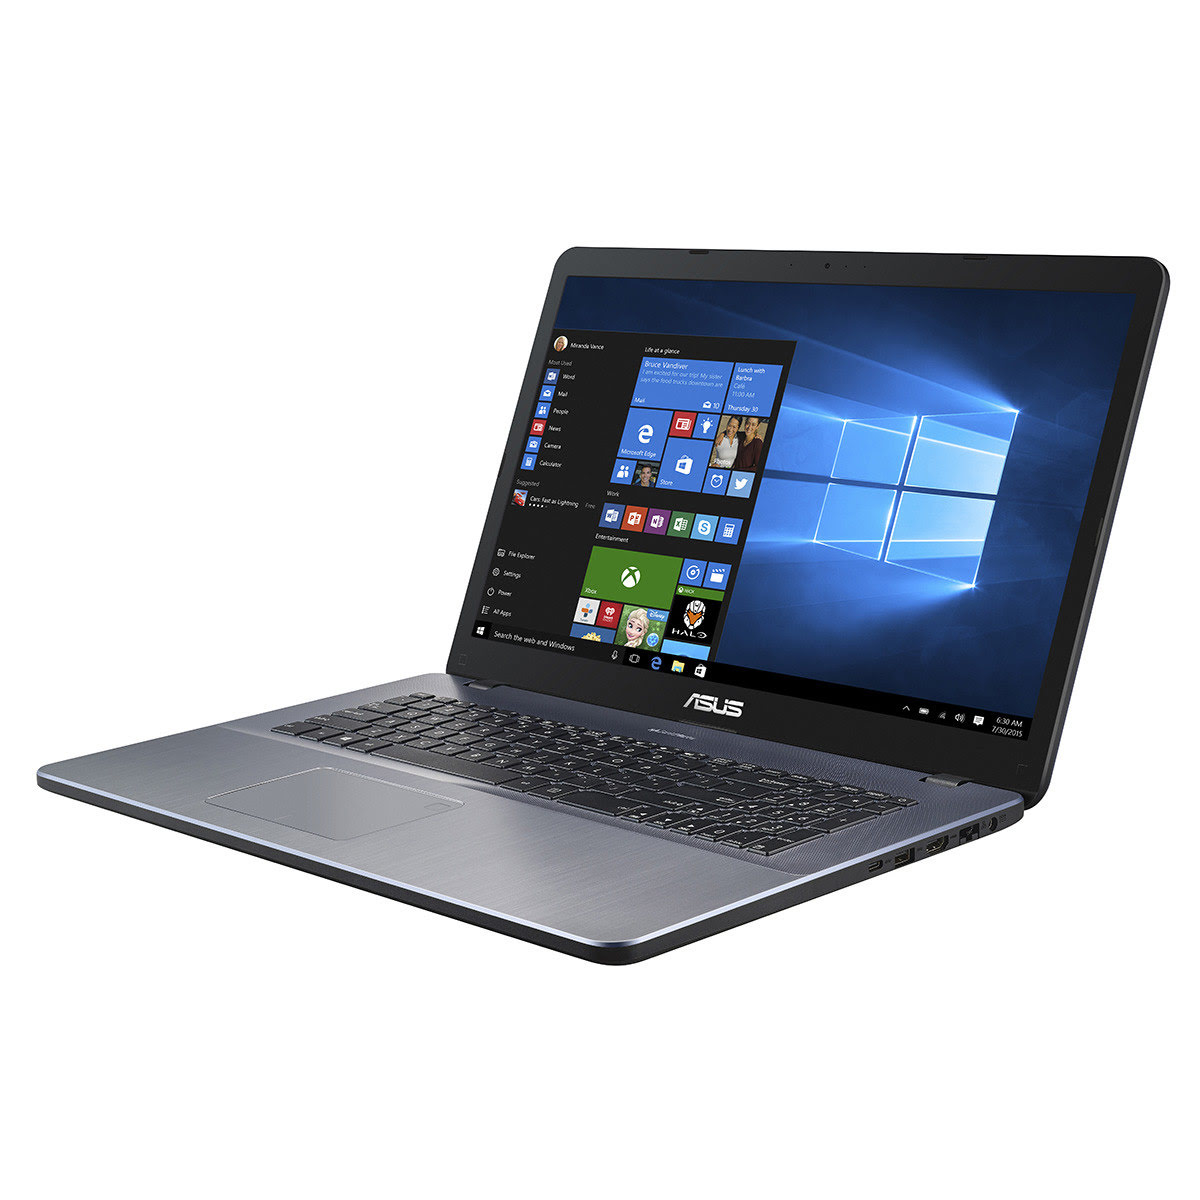 X705UF-GC118T - i5 8250/8G/256G+500G/MX130/17.3/10 (90NB0IE1-M01490) - Achat / Vente PC portable sur Picata.fr - 1